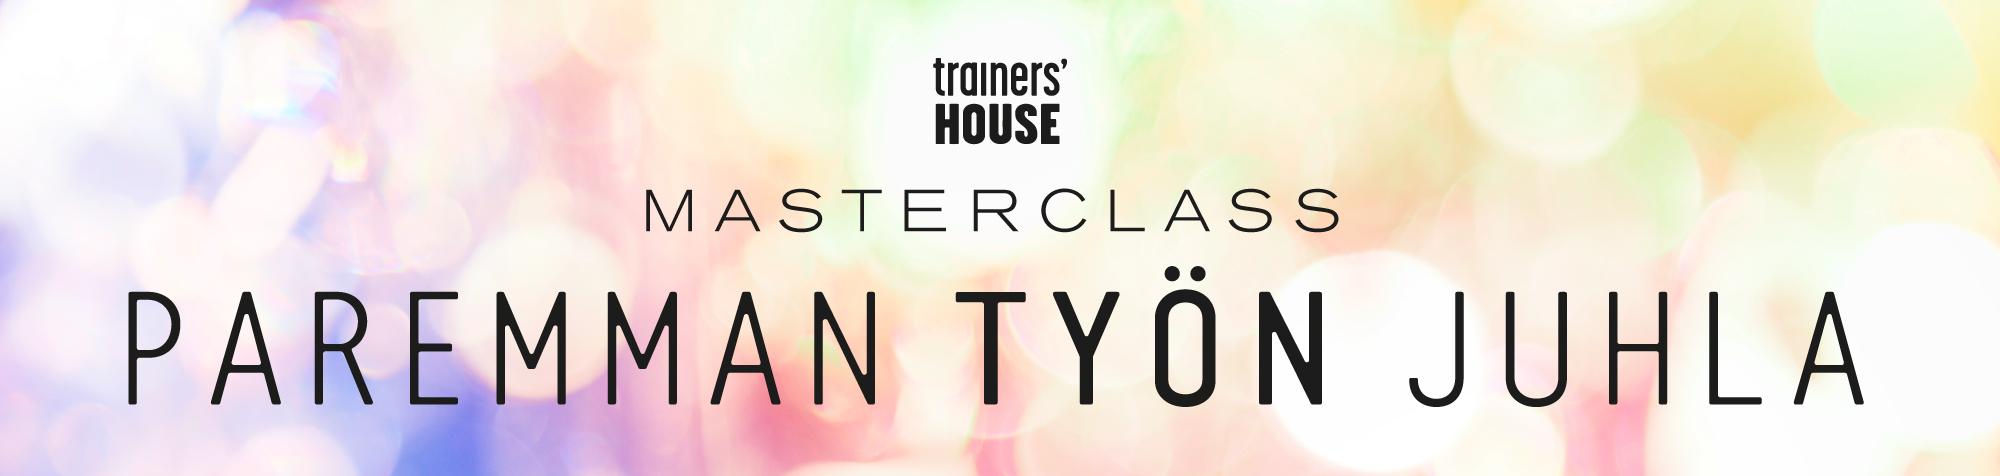 masterclass-header-2